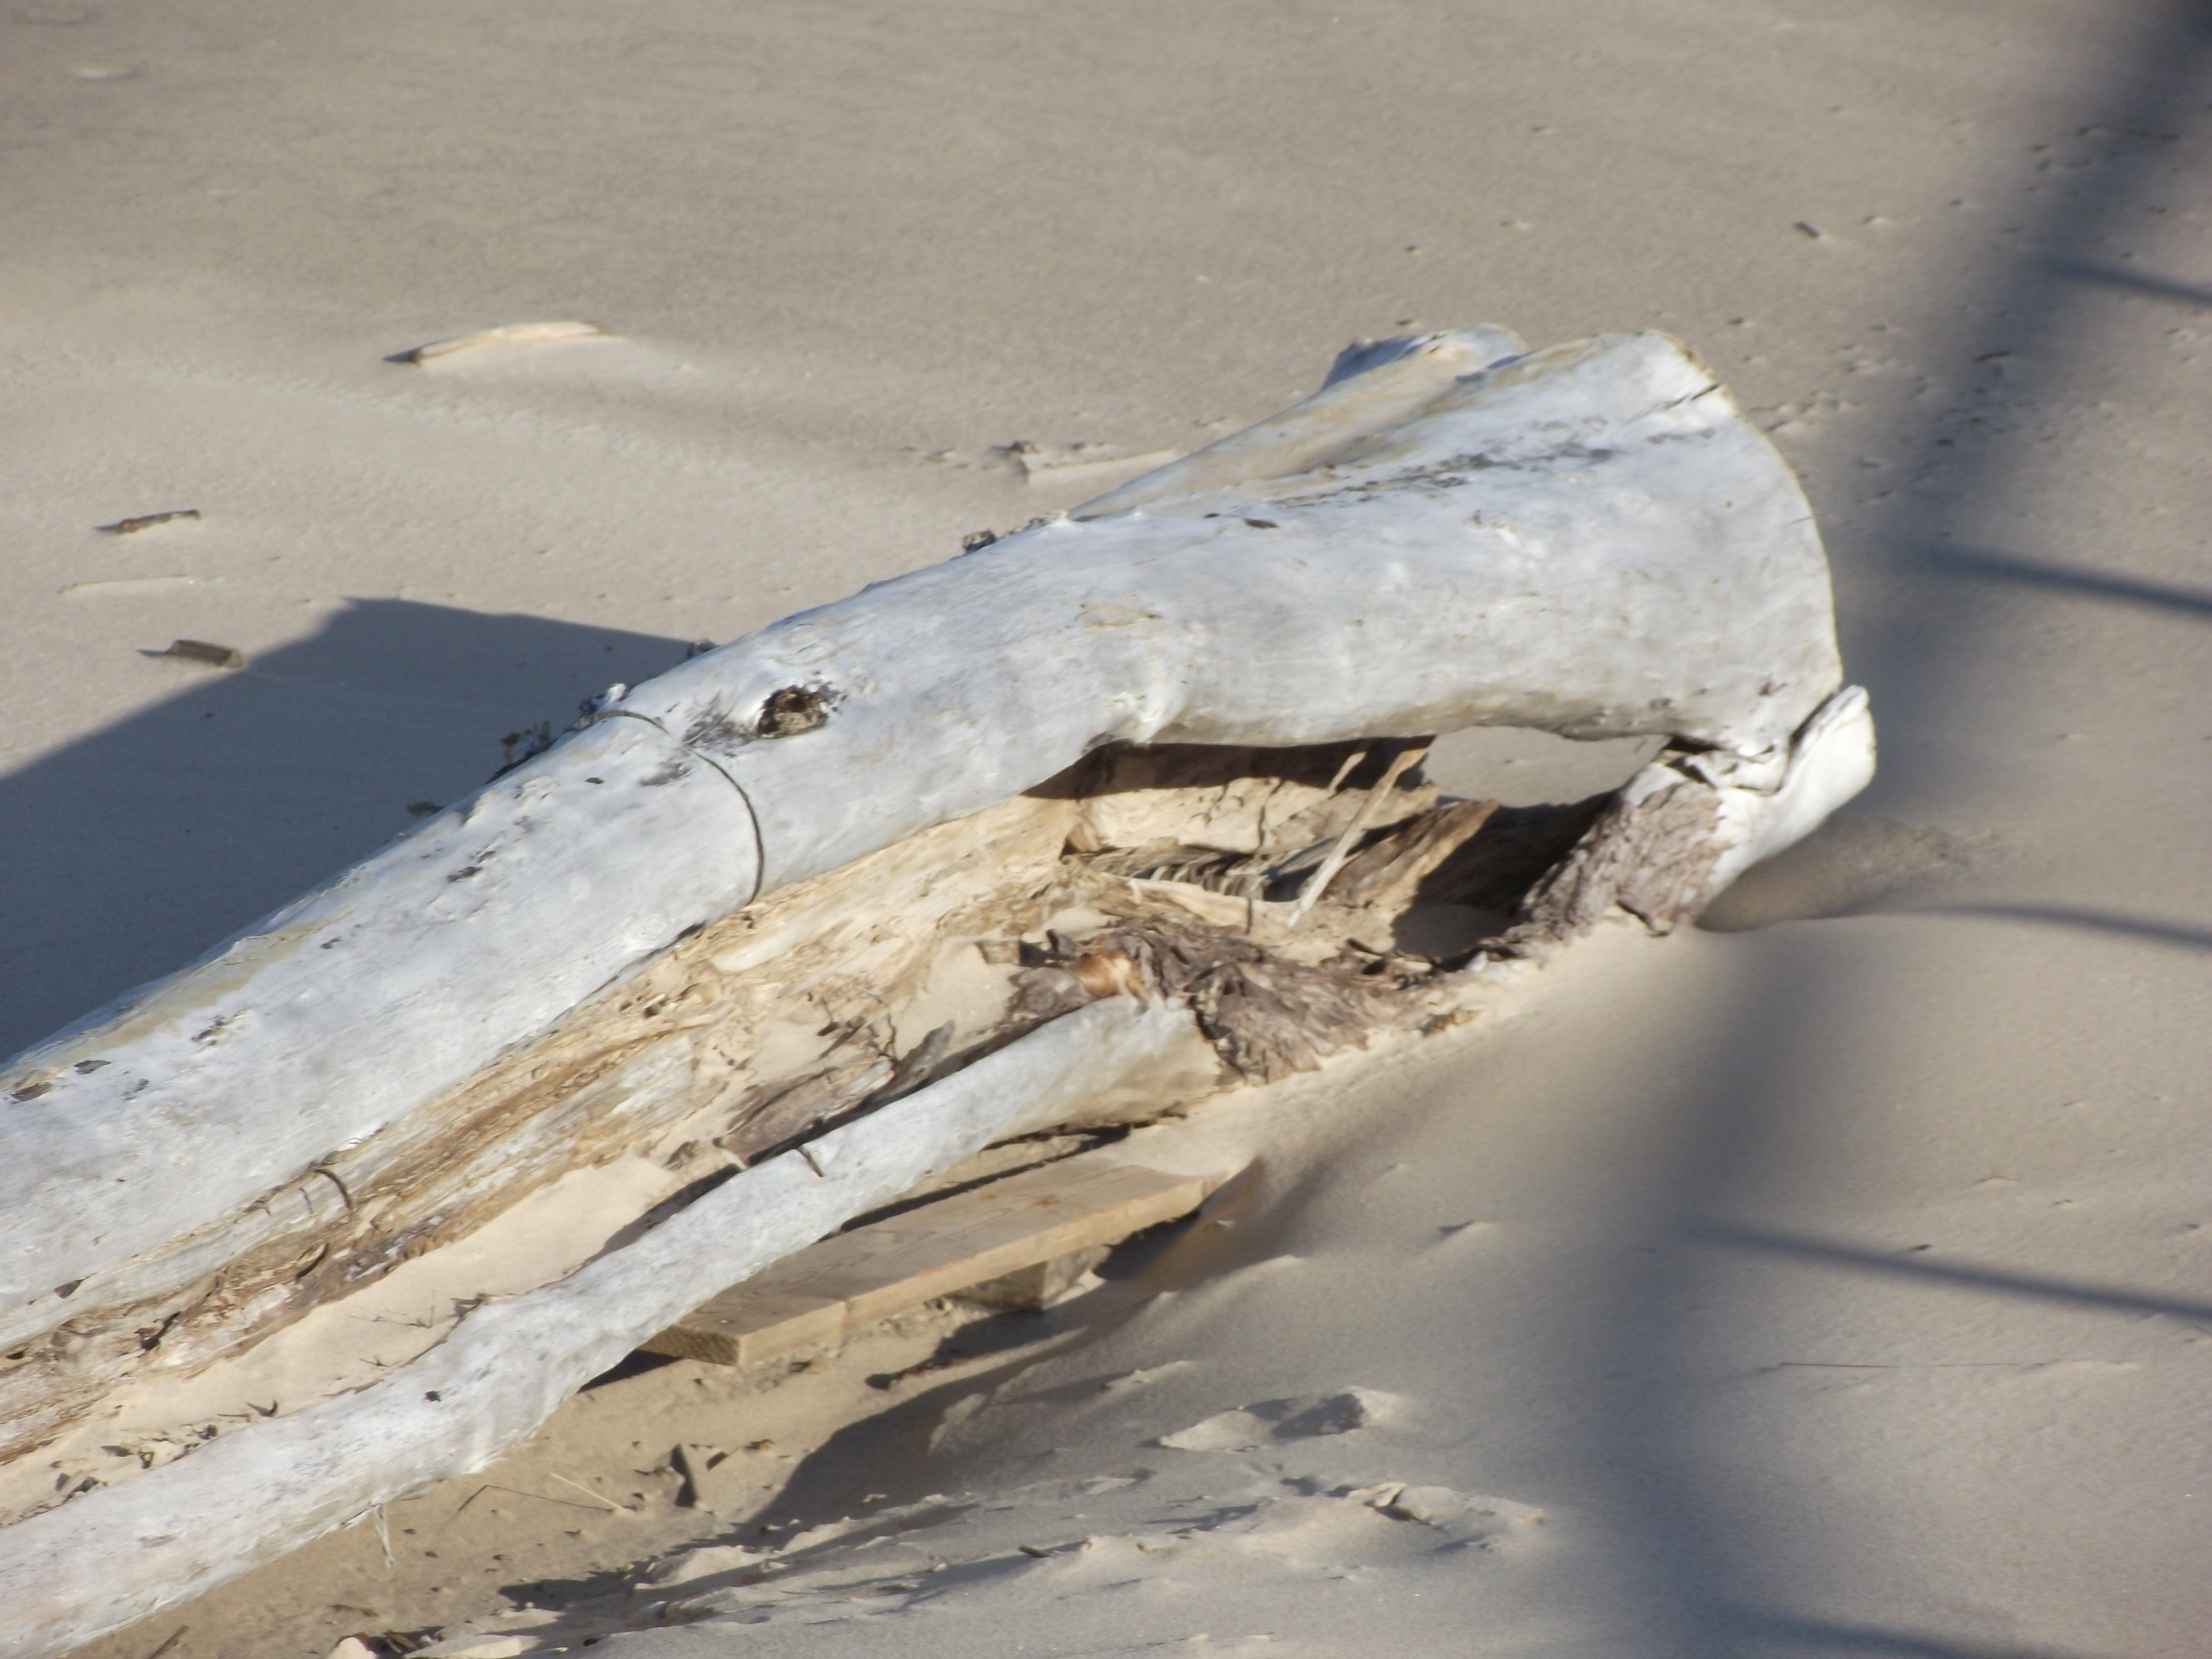 Seashore tree trunk, 2012, Shore, Washed, Wallpaper, HQ Photo